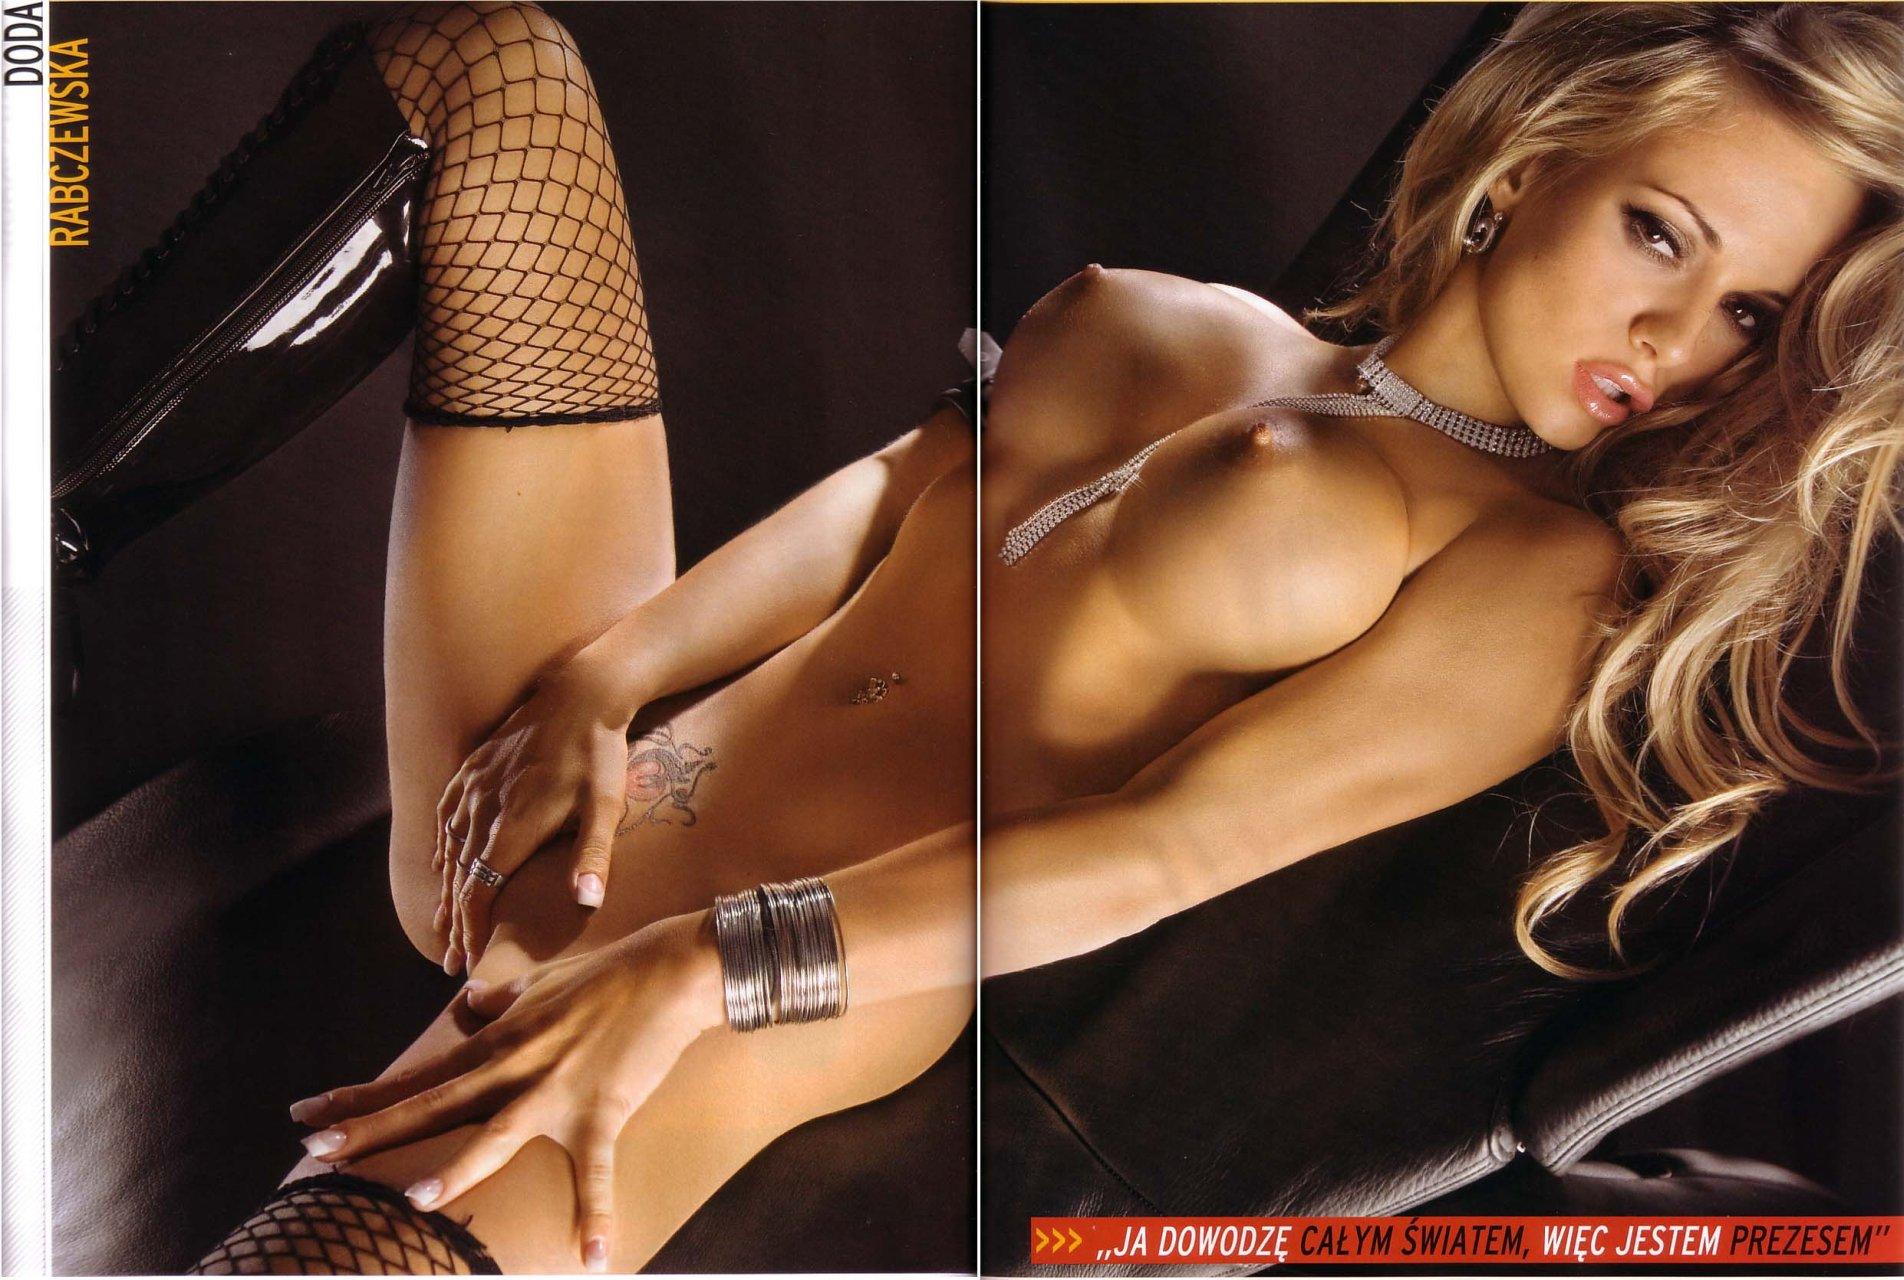 doda nude & sexy (53 photos) | #thefappening